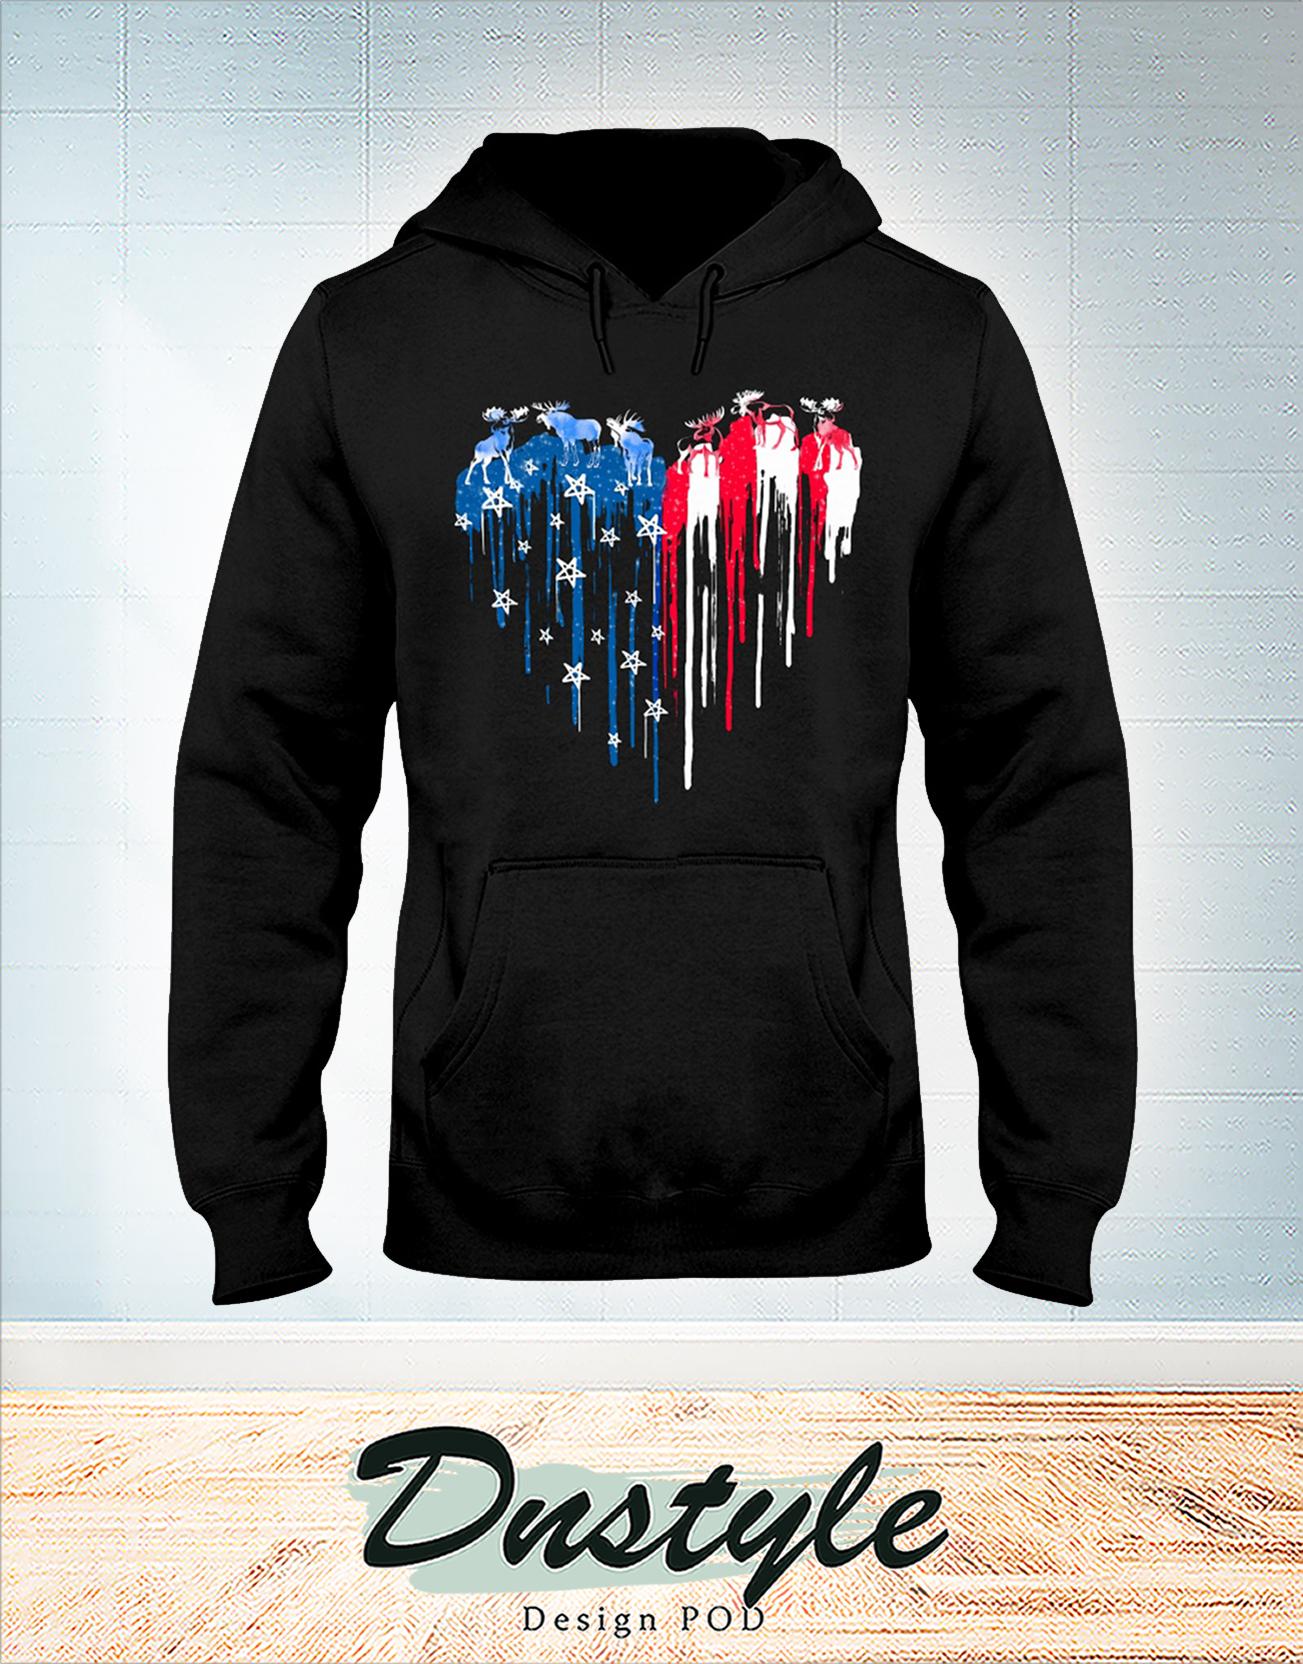 Moose freedom heart color american flag 4th of july hoodie